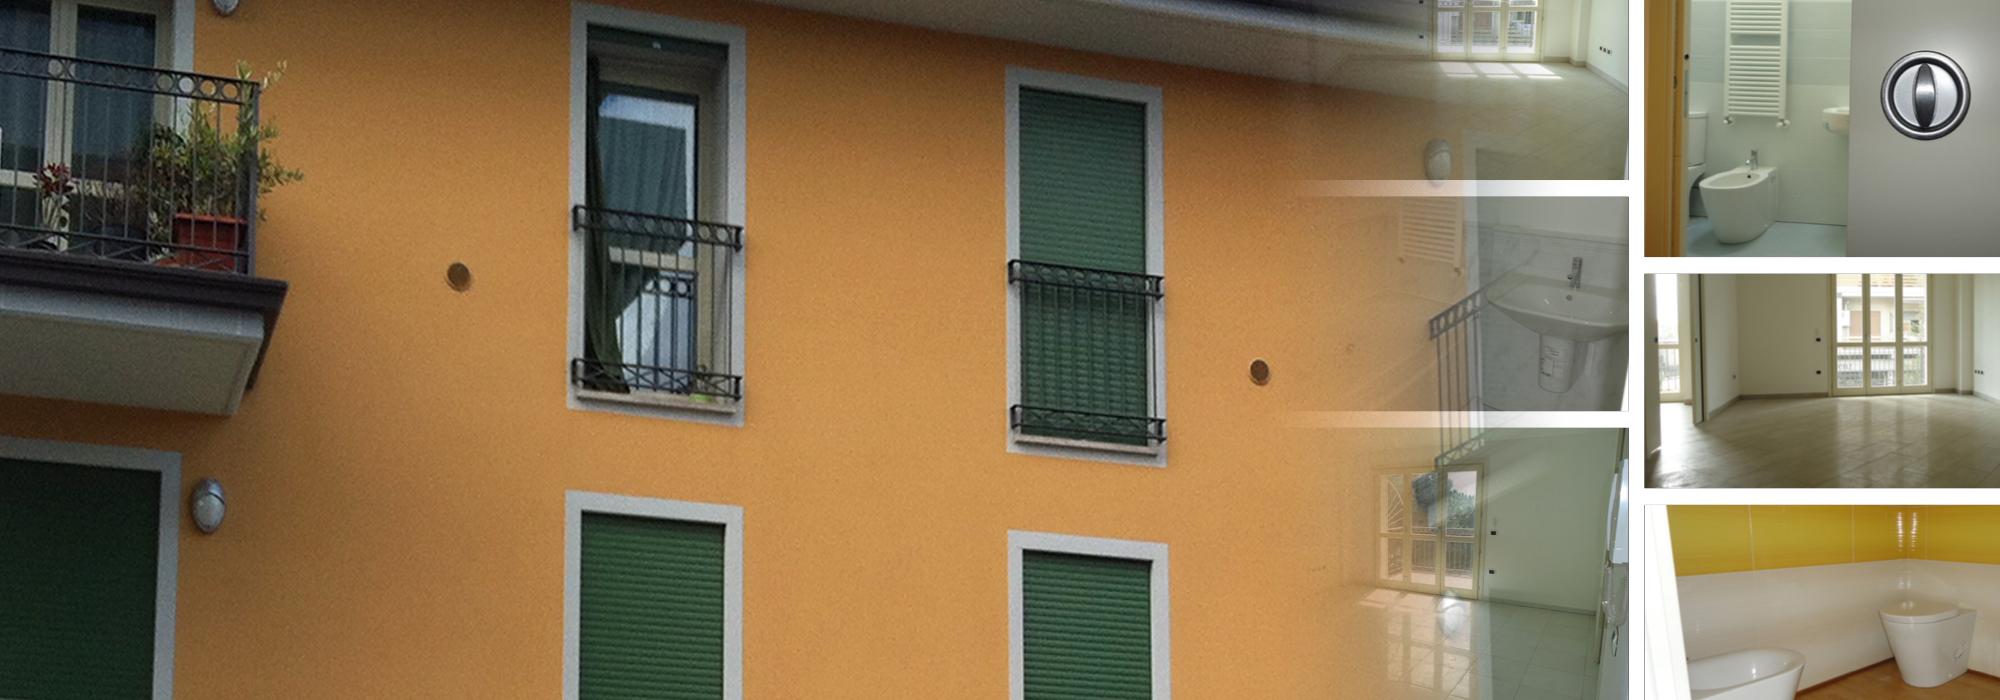 Complesso residenziale Eudora